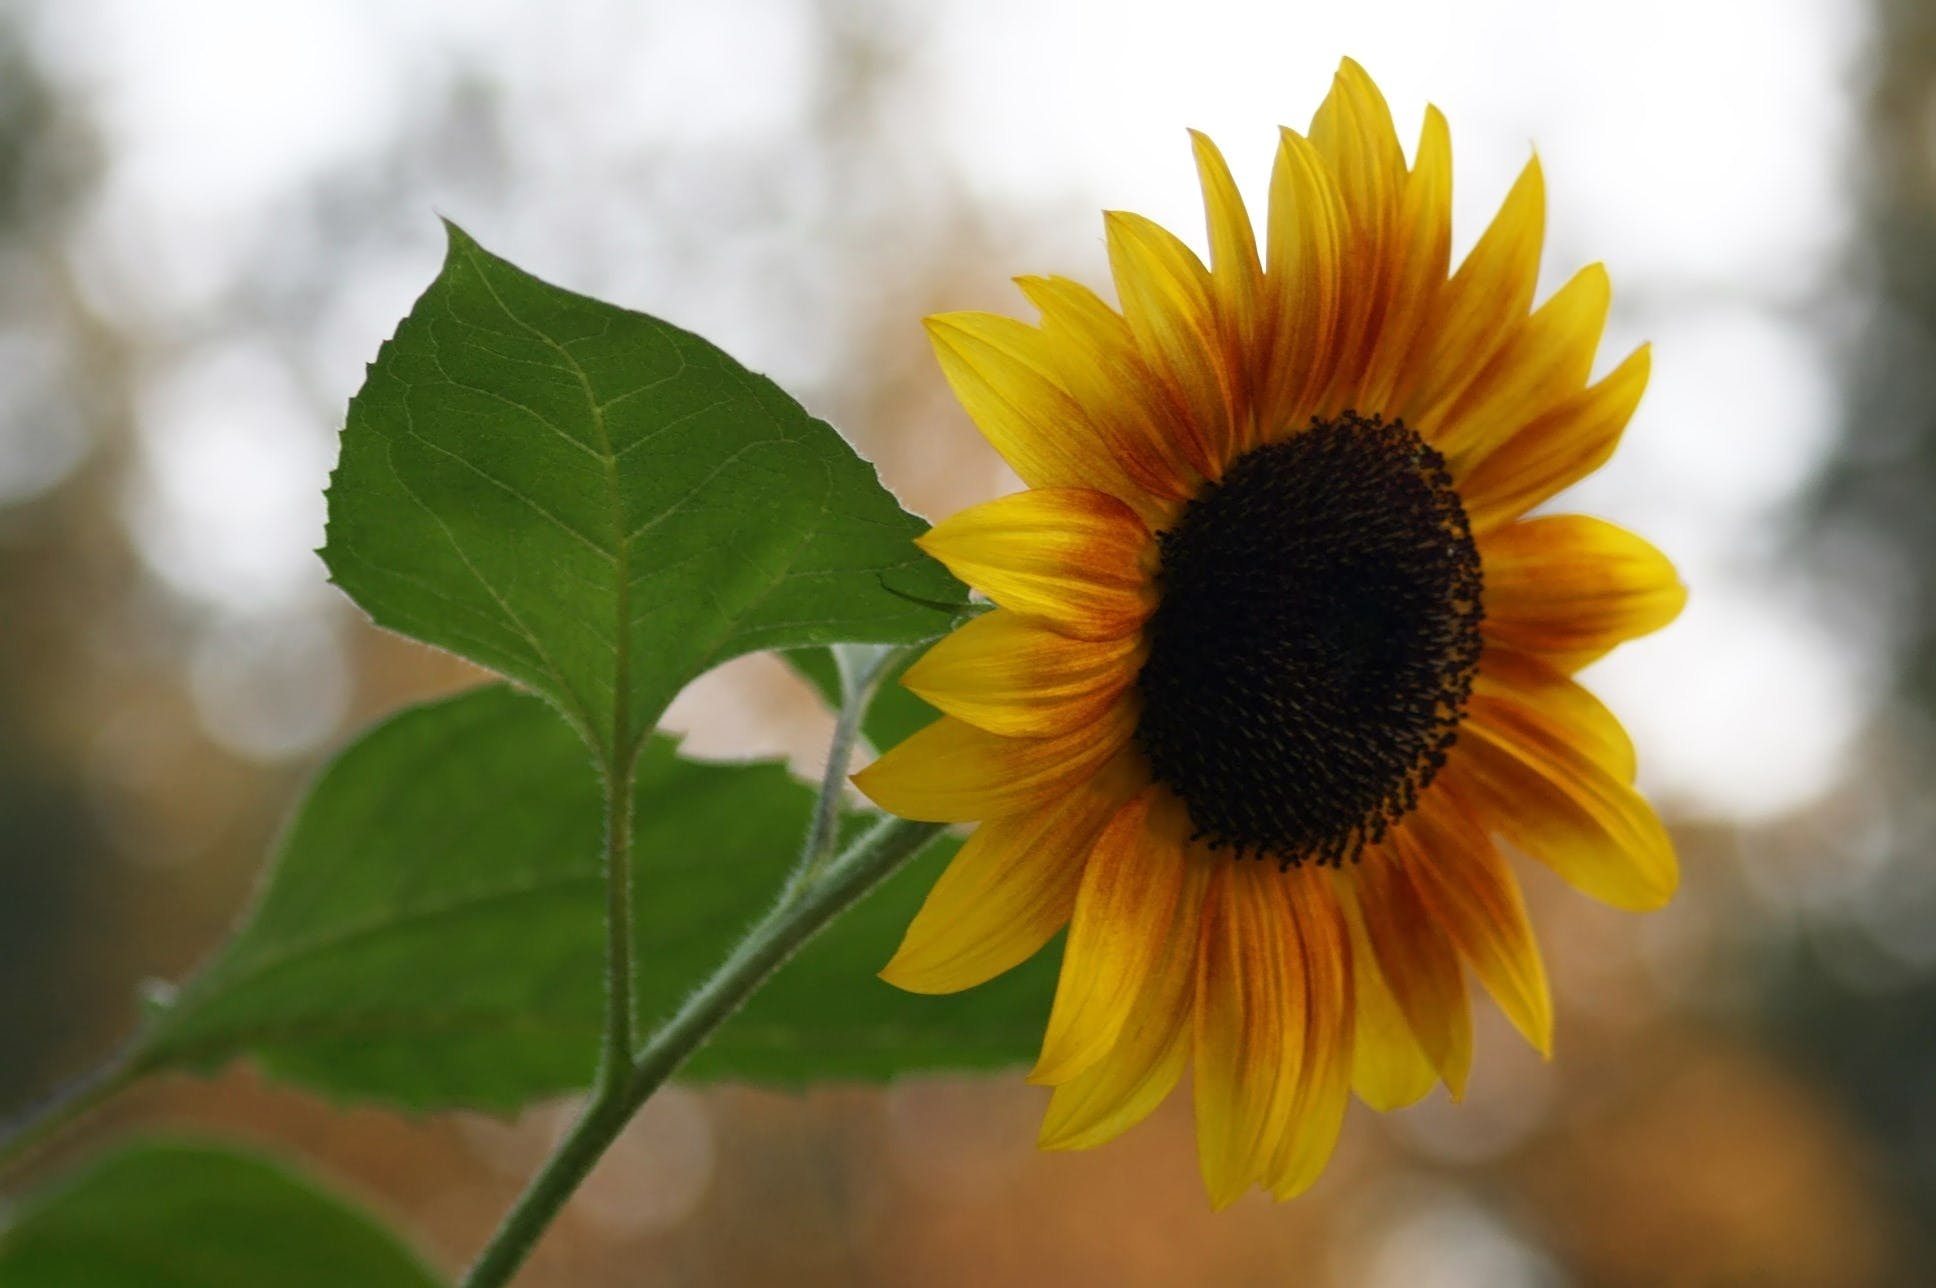 Gratis arkivbilde med blomst, solsikke